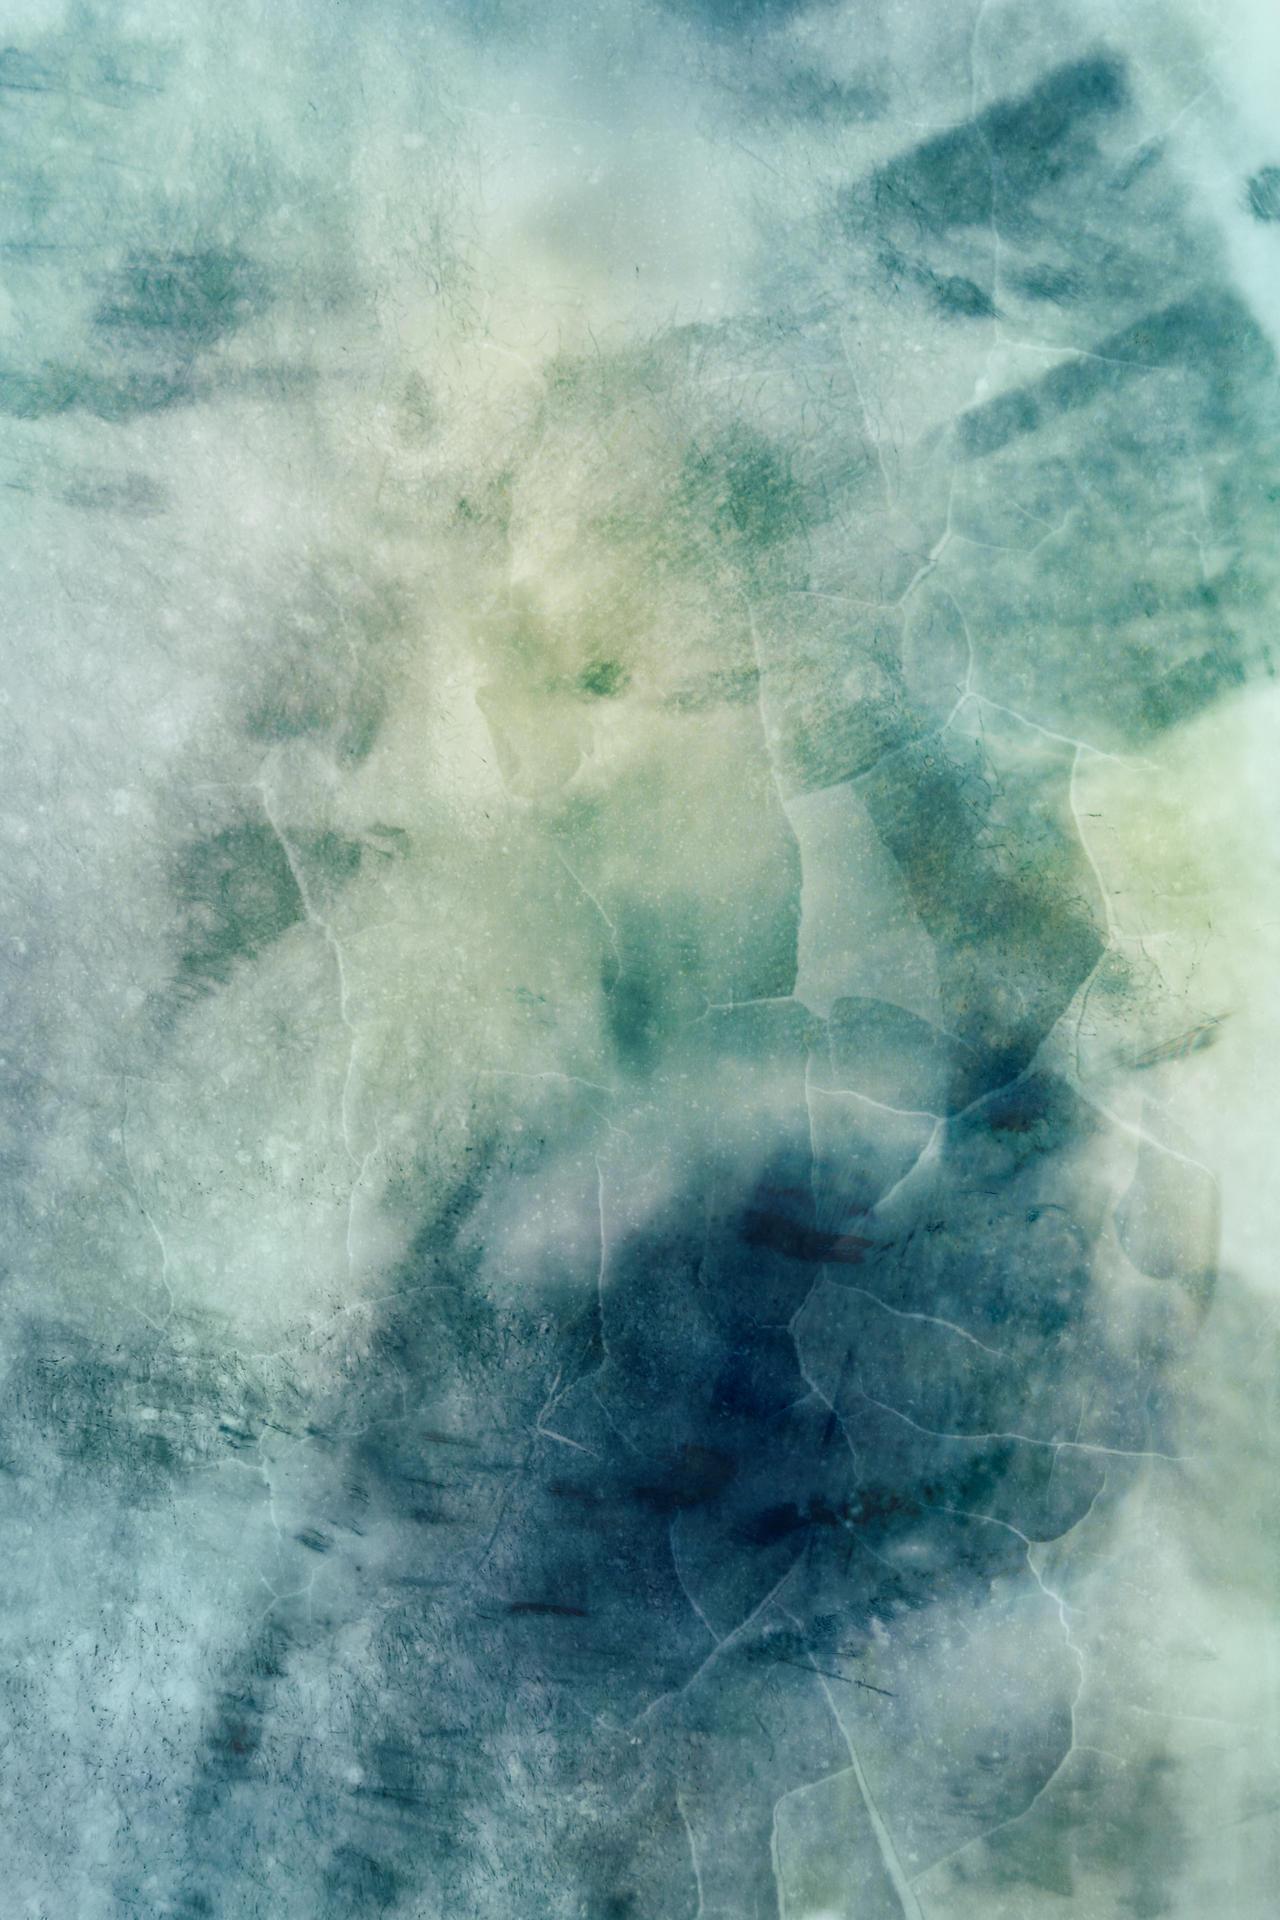 Digital Art Texture 57 by mercurycode